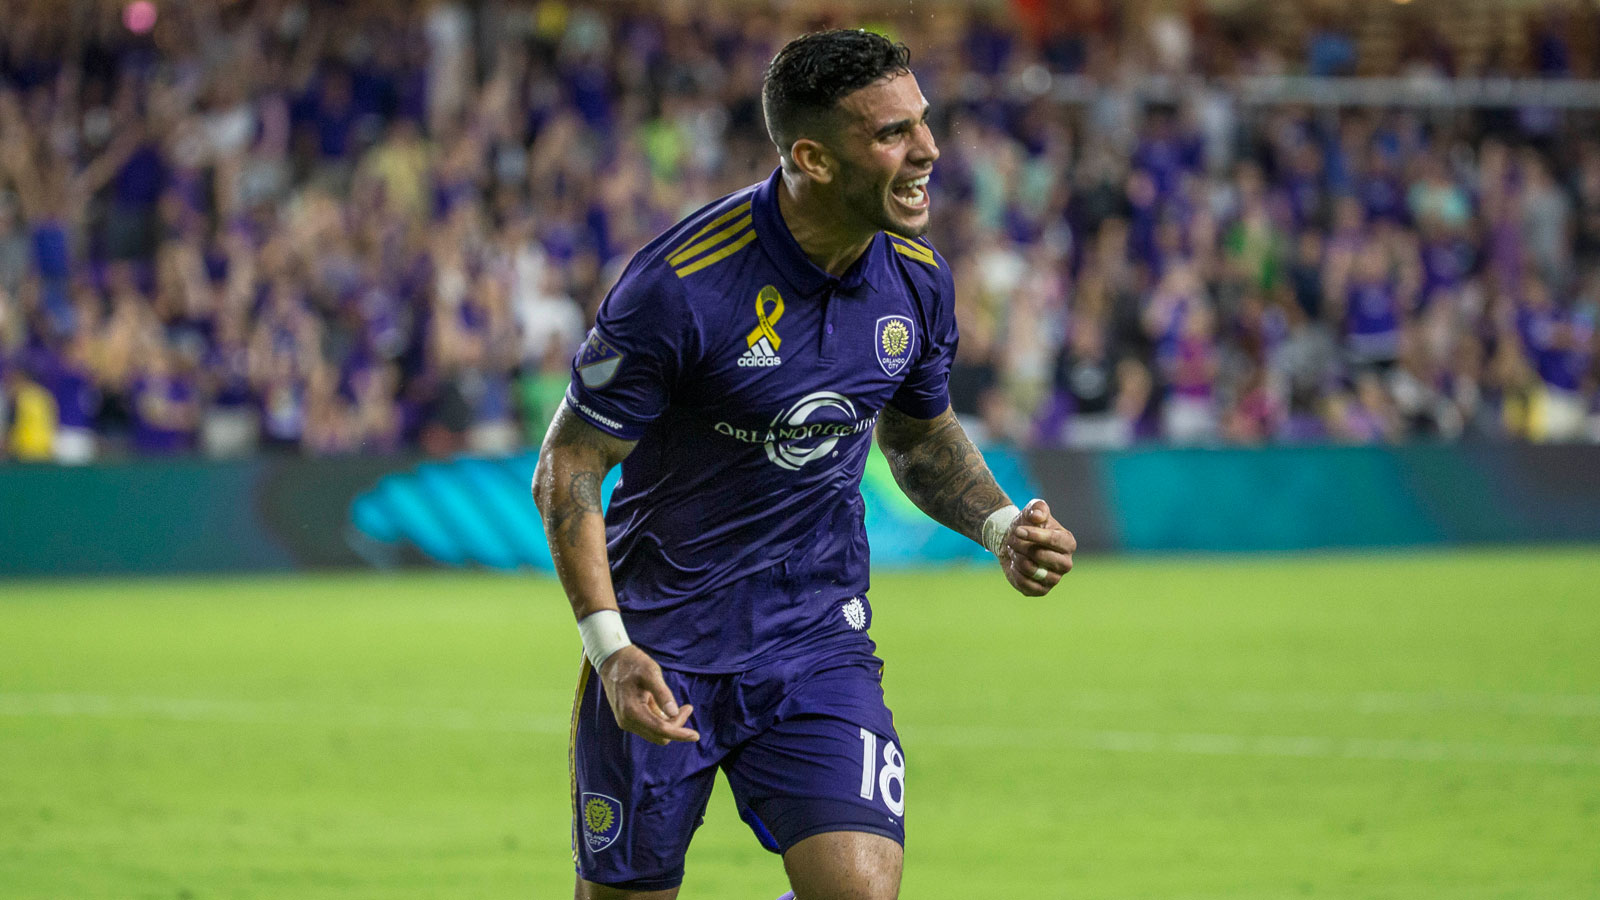 Orlando City signs forward Dom Dwyer to a 3-year deal